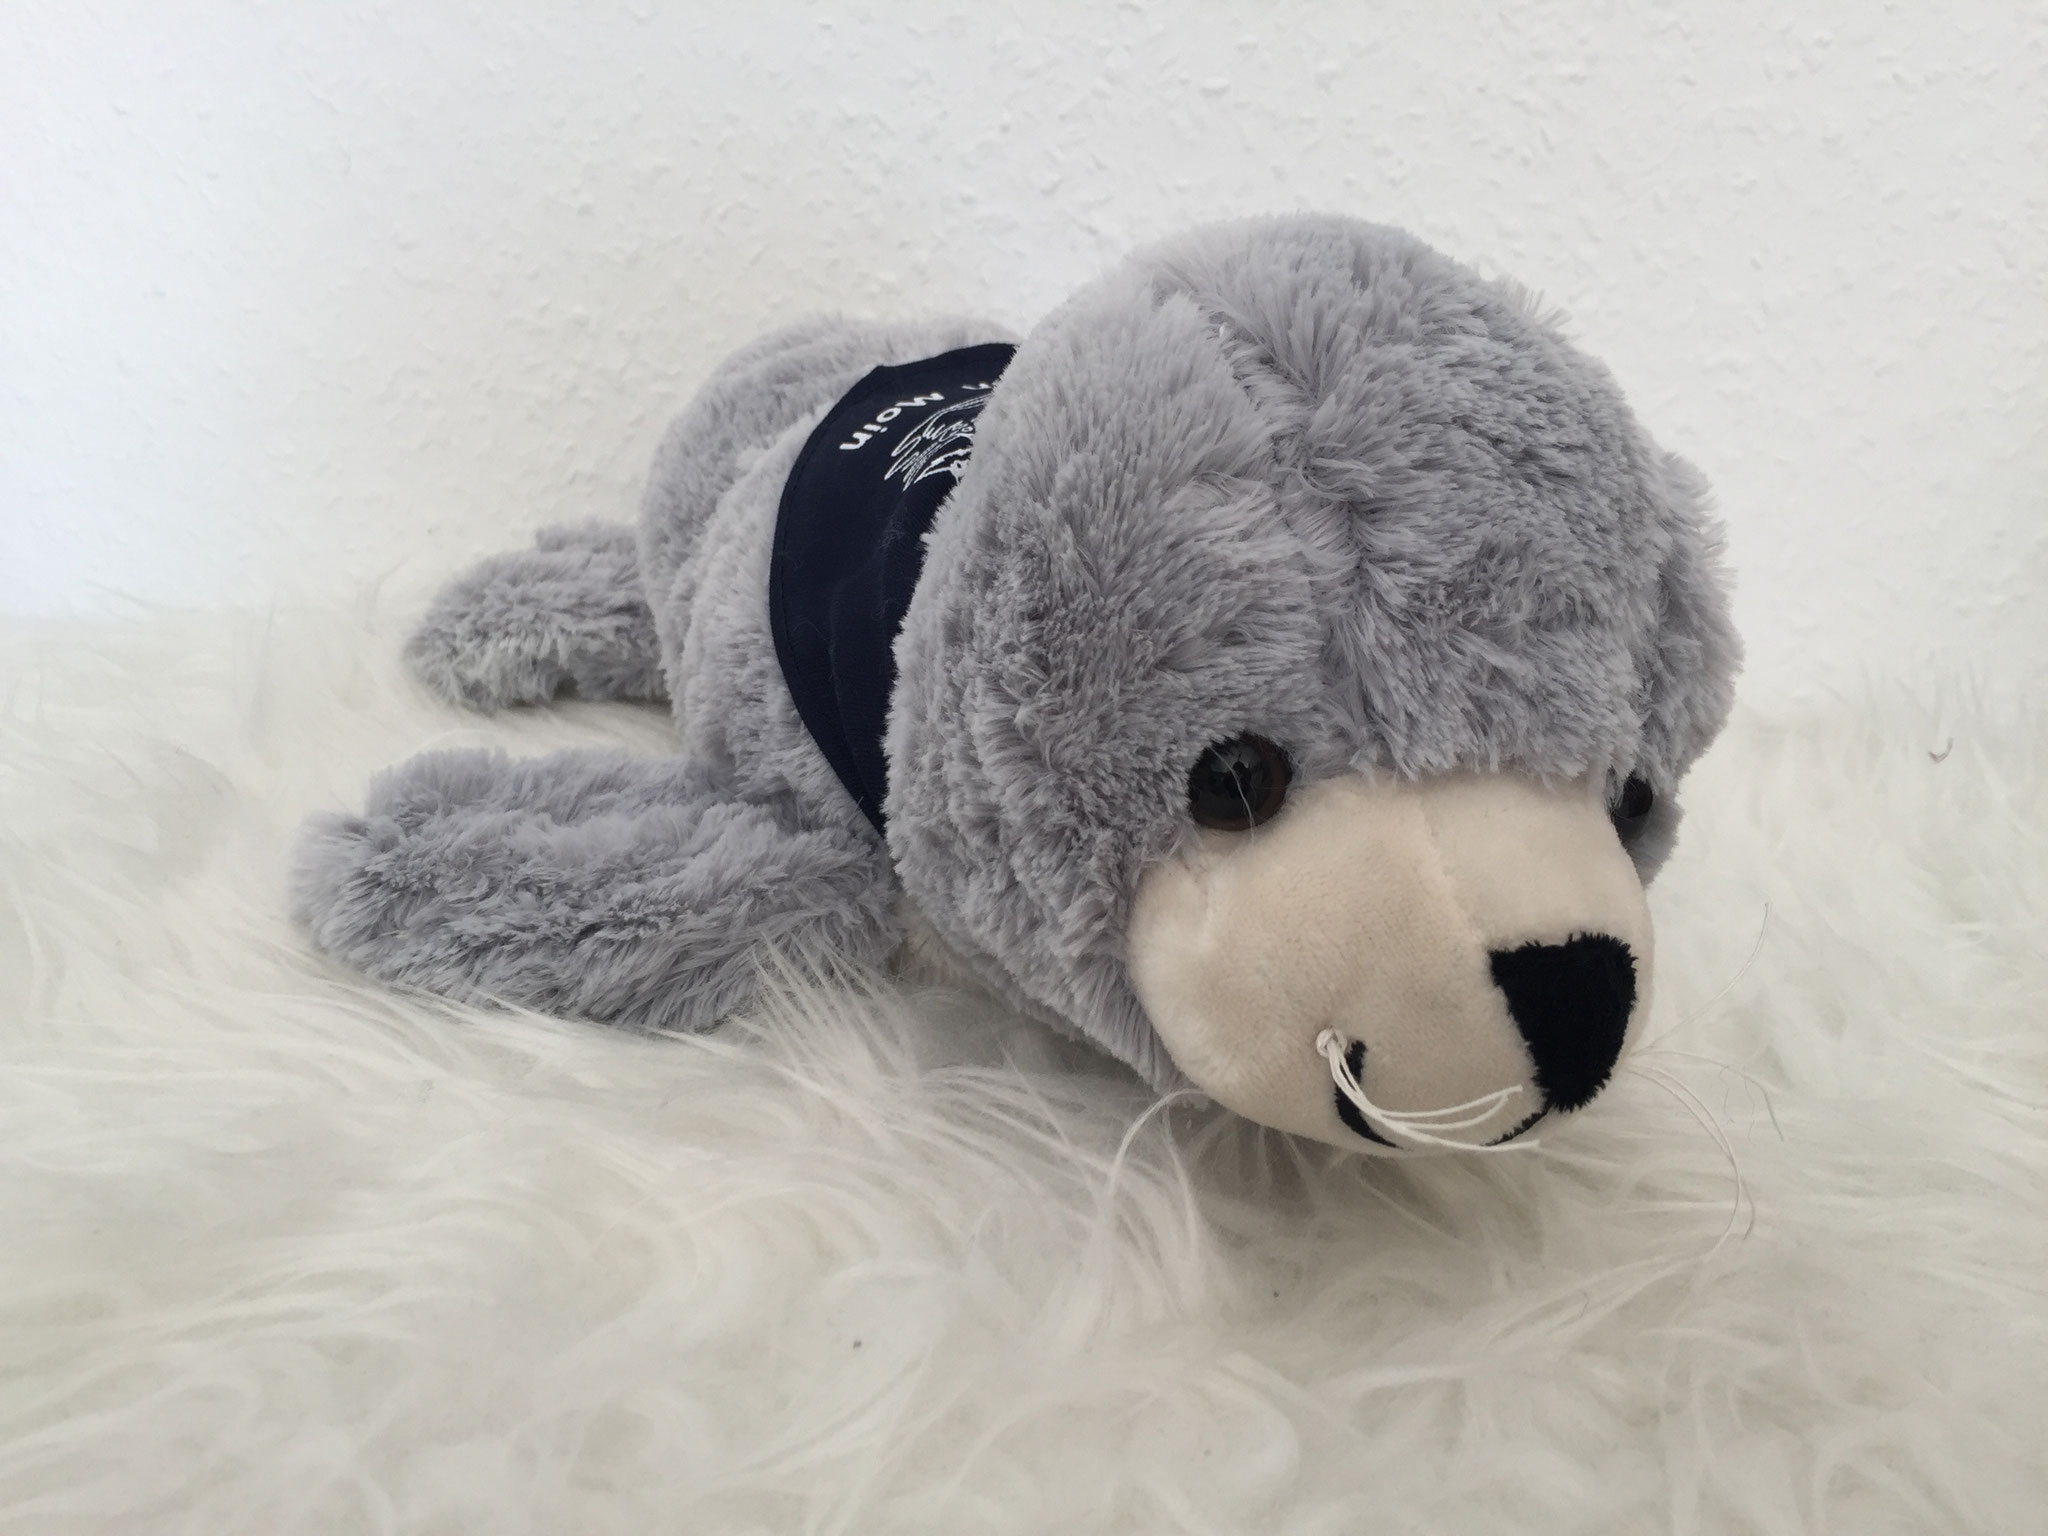 Klasse 3a - Klassenlehrerin Frau Reploh – Klassentier Piet, der Seehund